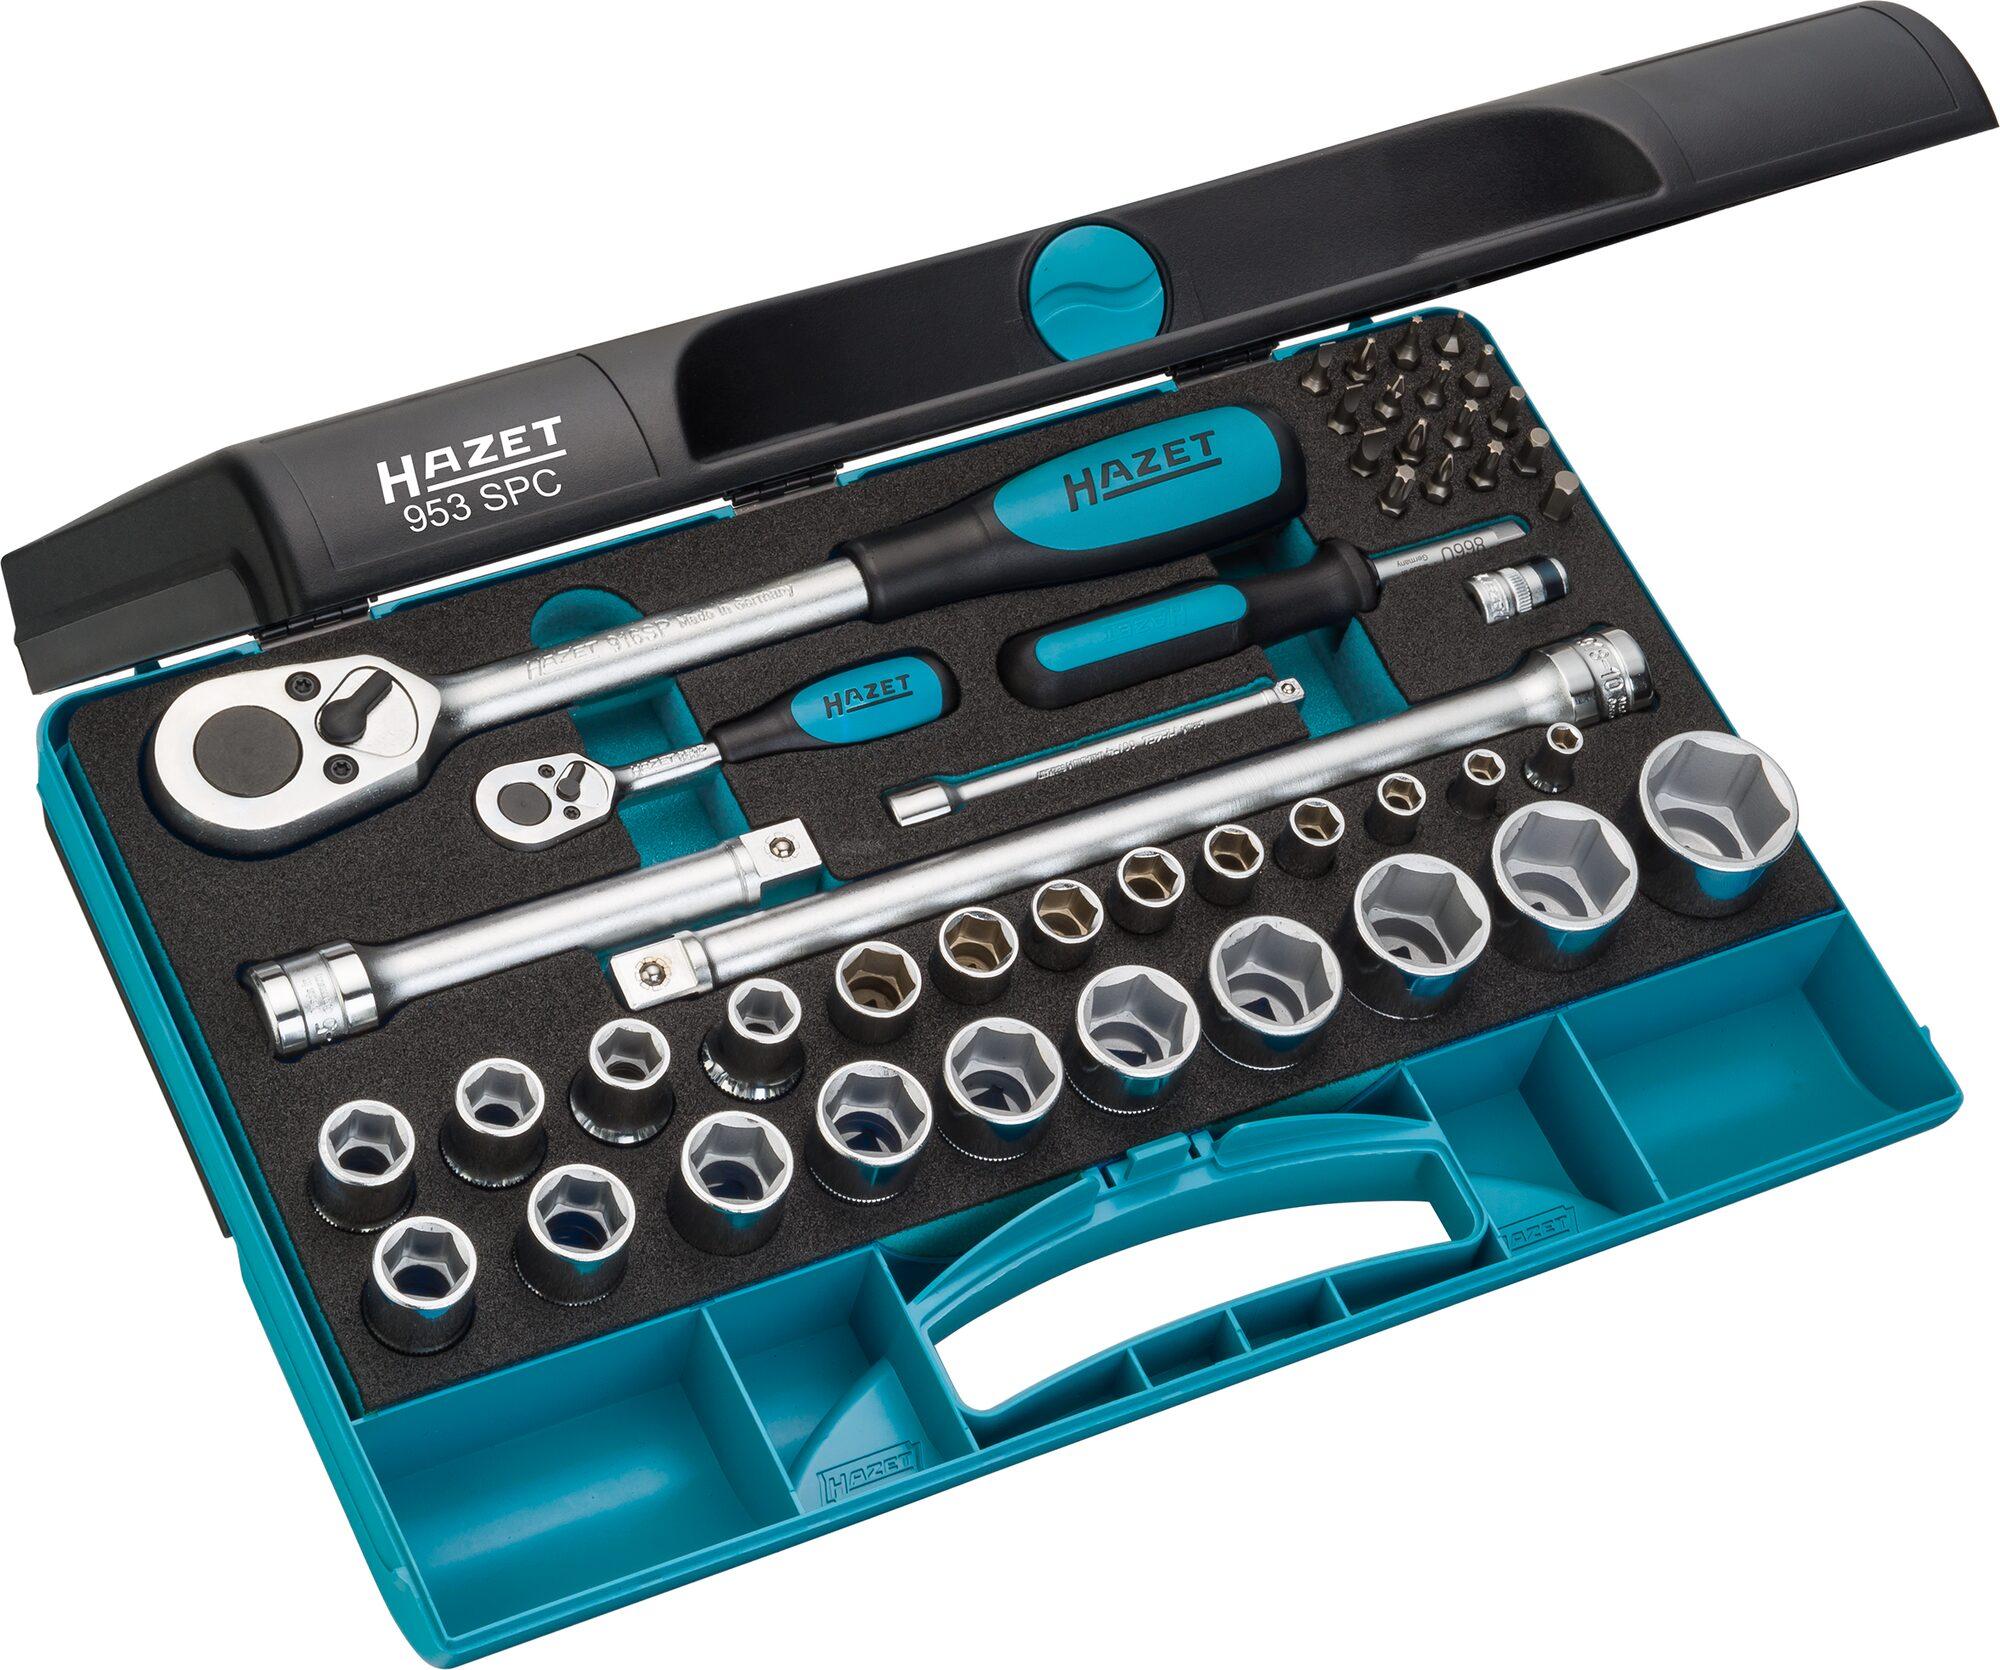 HAZET Steckschlüssel Satz 953SPC ∙ Vierkant hohl 12,5 mm (1/2 Zoll) ∙ Anzahl Werkzeuge: 47